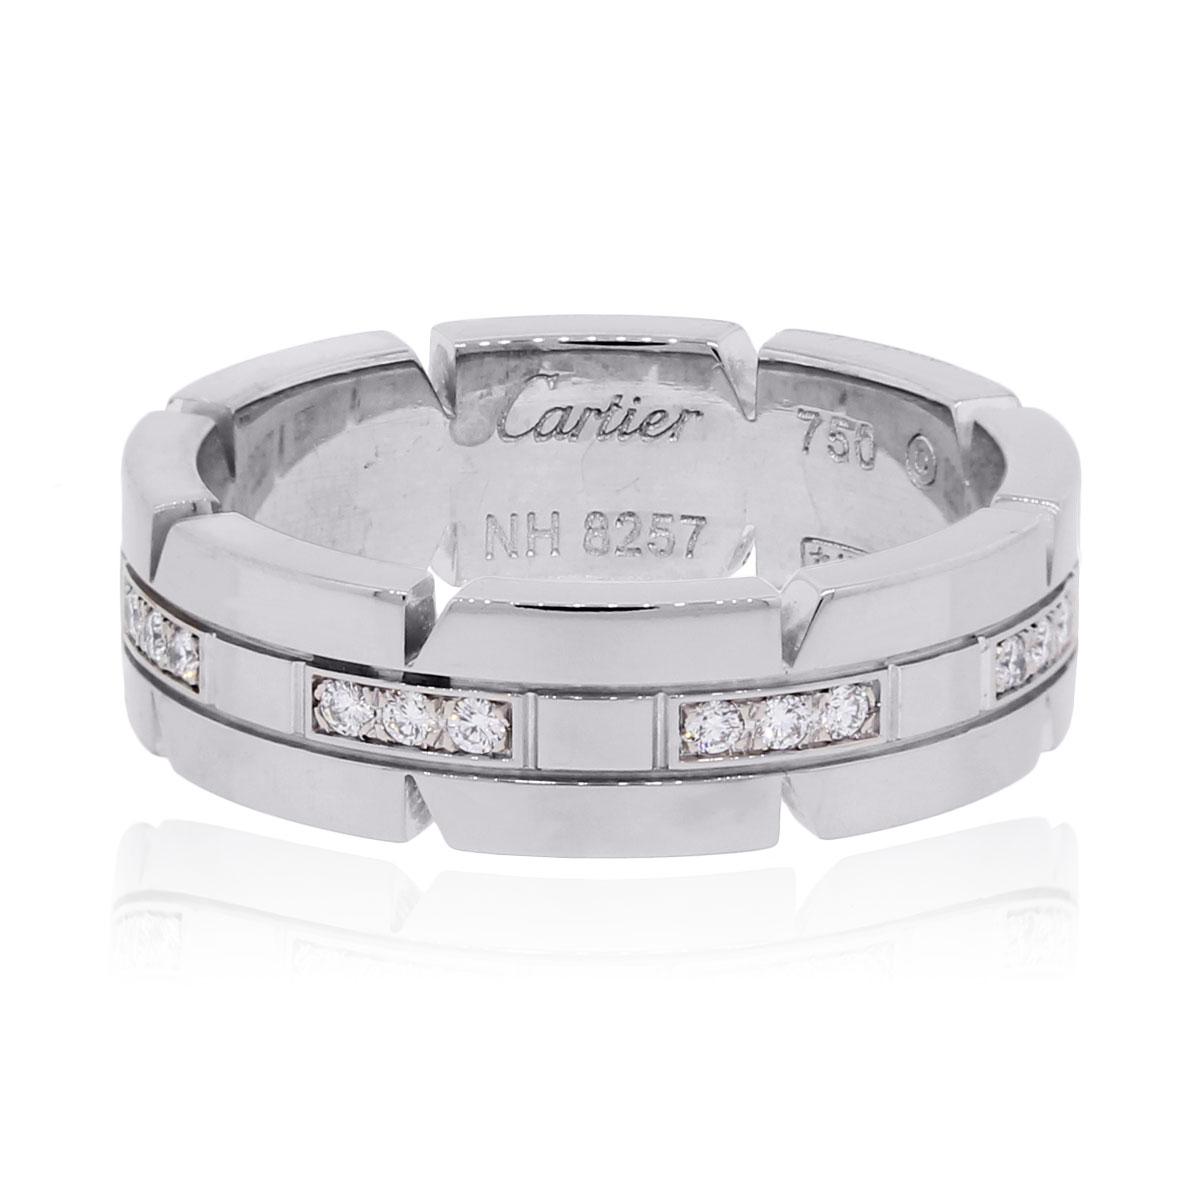 Cartier tank francaise 18k white gold diamond wedding band ring cartier tank francaise 18k white gold diamond wedding band ring size 75 cartier buy at truefacet junglespirit Image collections